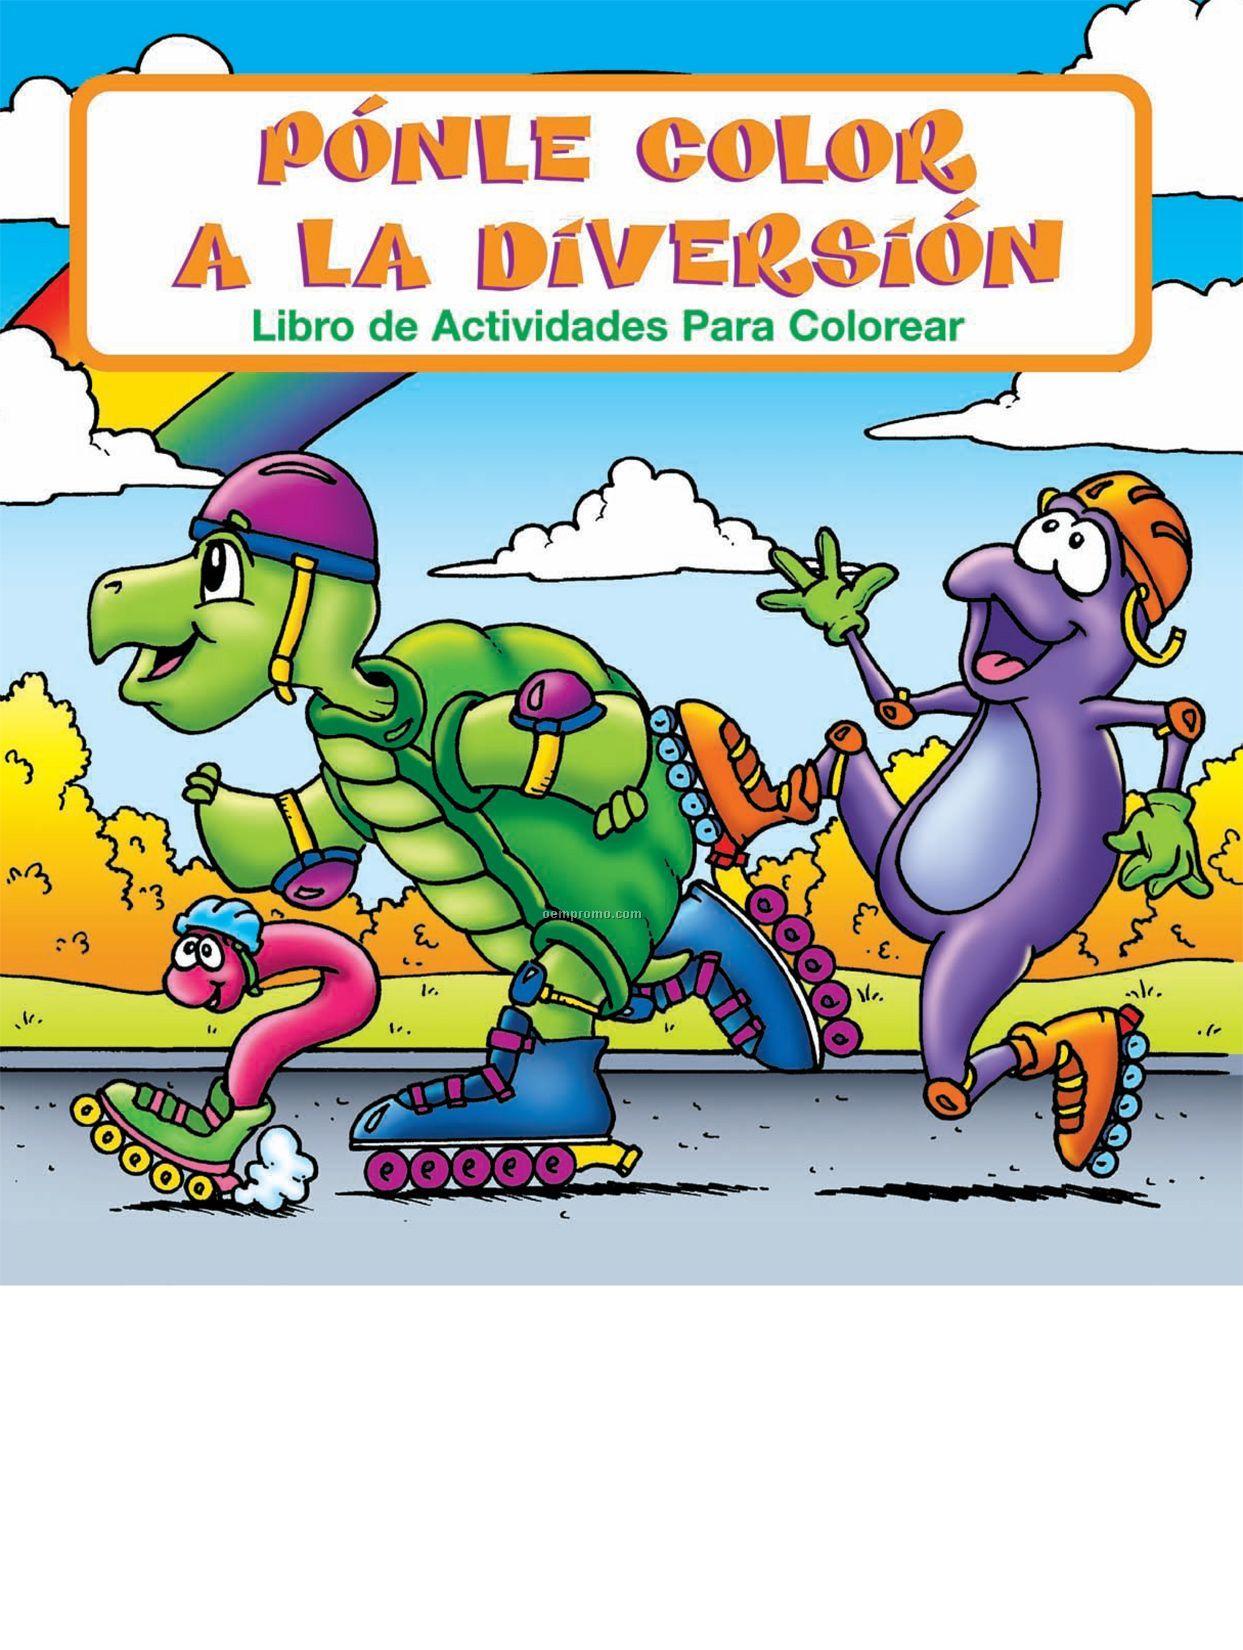 Fun To Color - Ponle Color A La Diversion Spanish Coloring Book